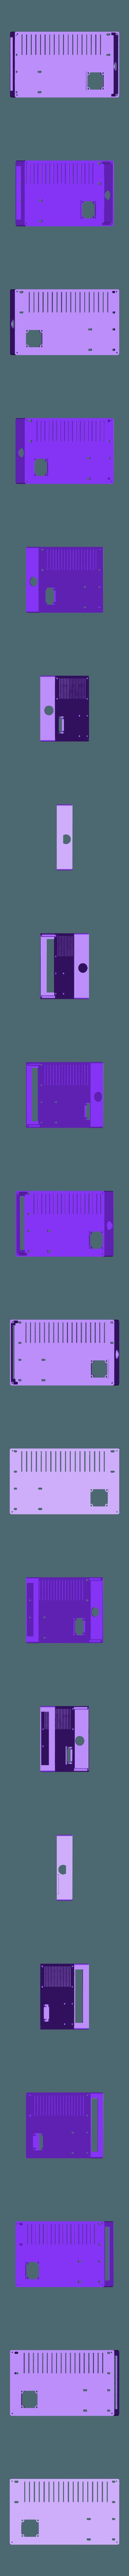 Melzi_2040_Case_Box.stl Download free SCAD file Melzi 2040 Electronics Case • Template to 3D print, trg3dp